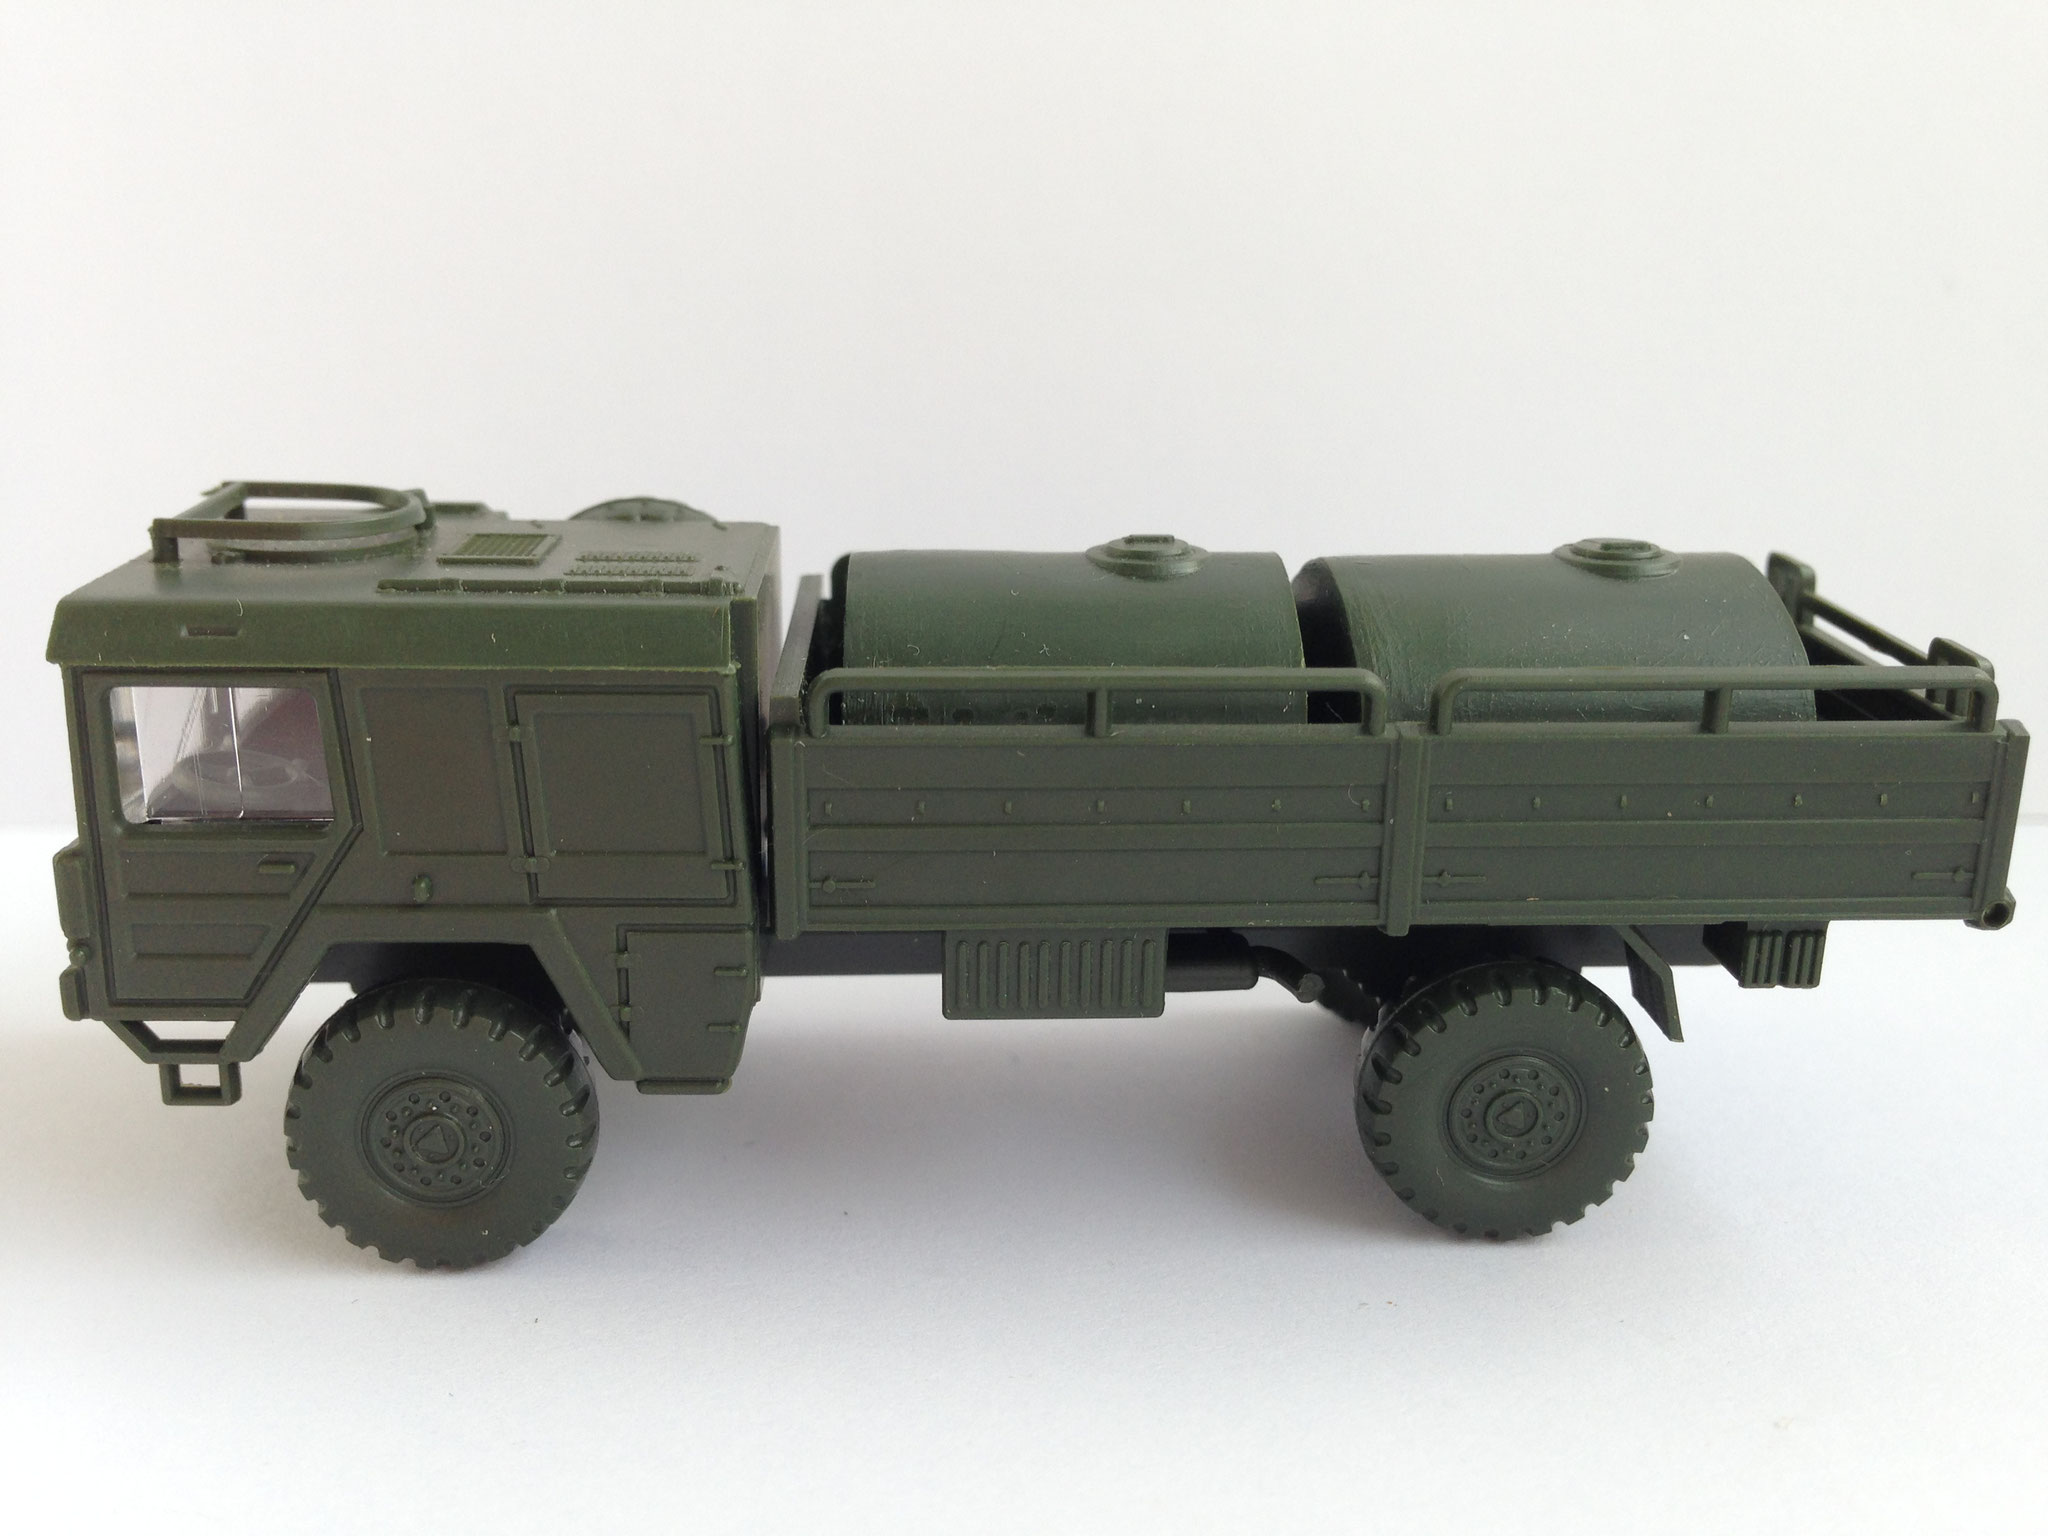 MAN 5 t mit Tankbehältern, Art. Nr. 73 (ab 1978 im Programm)